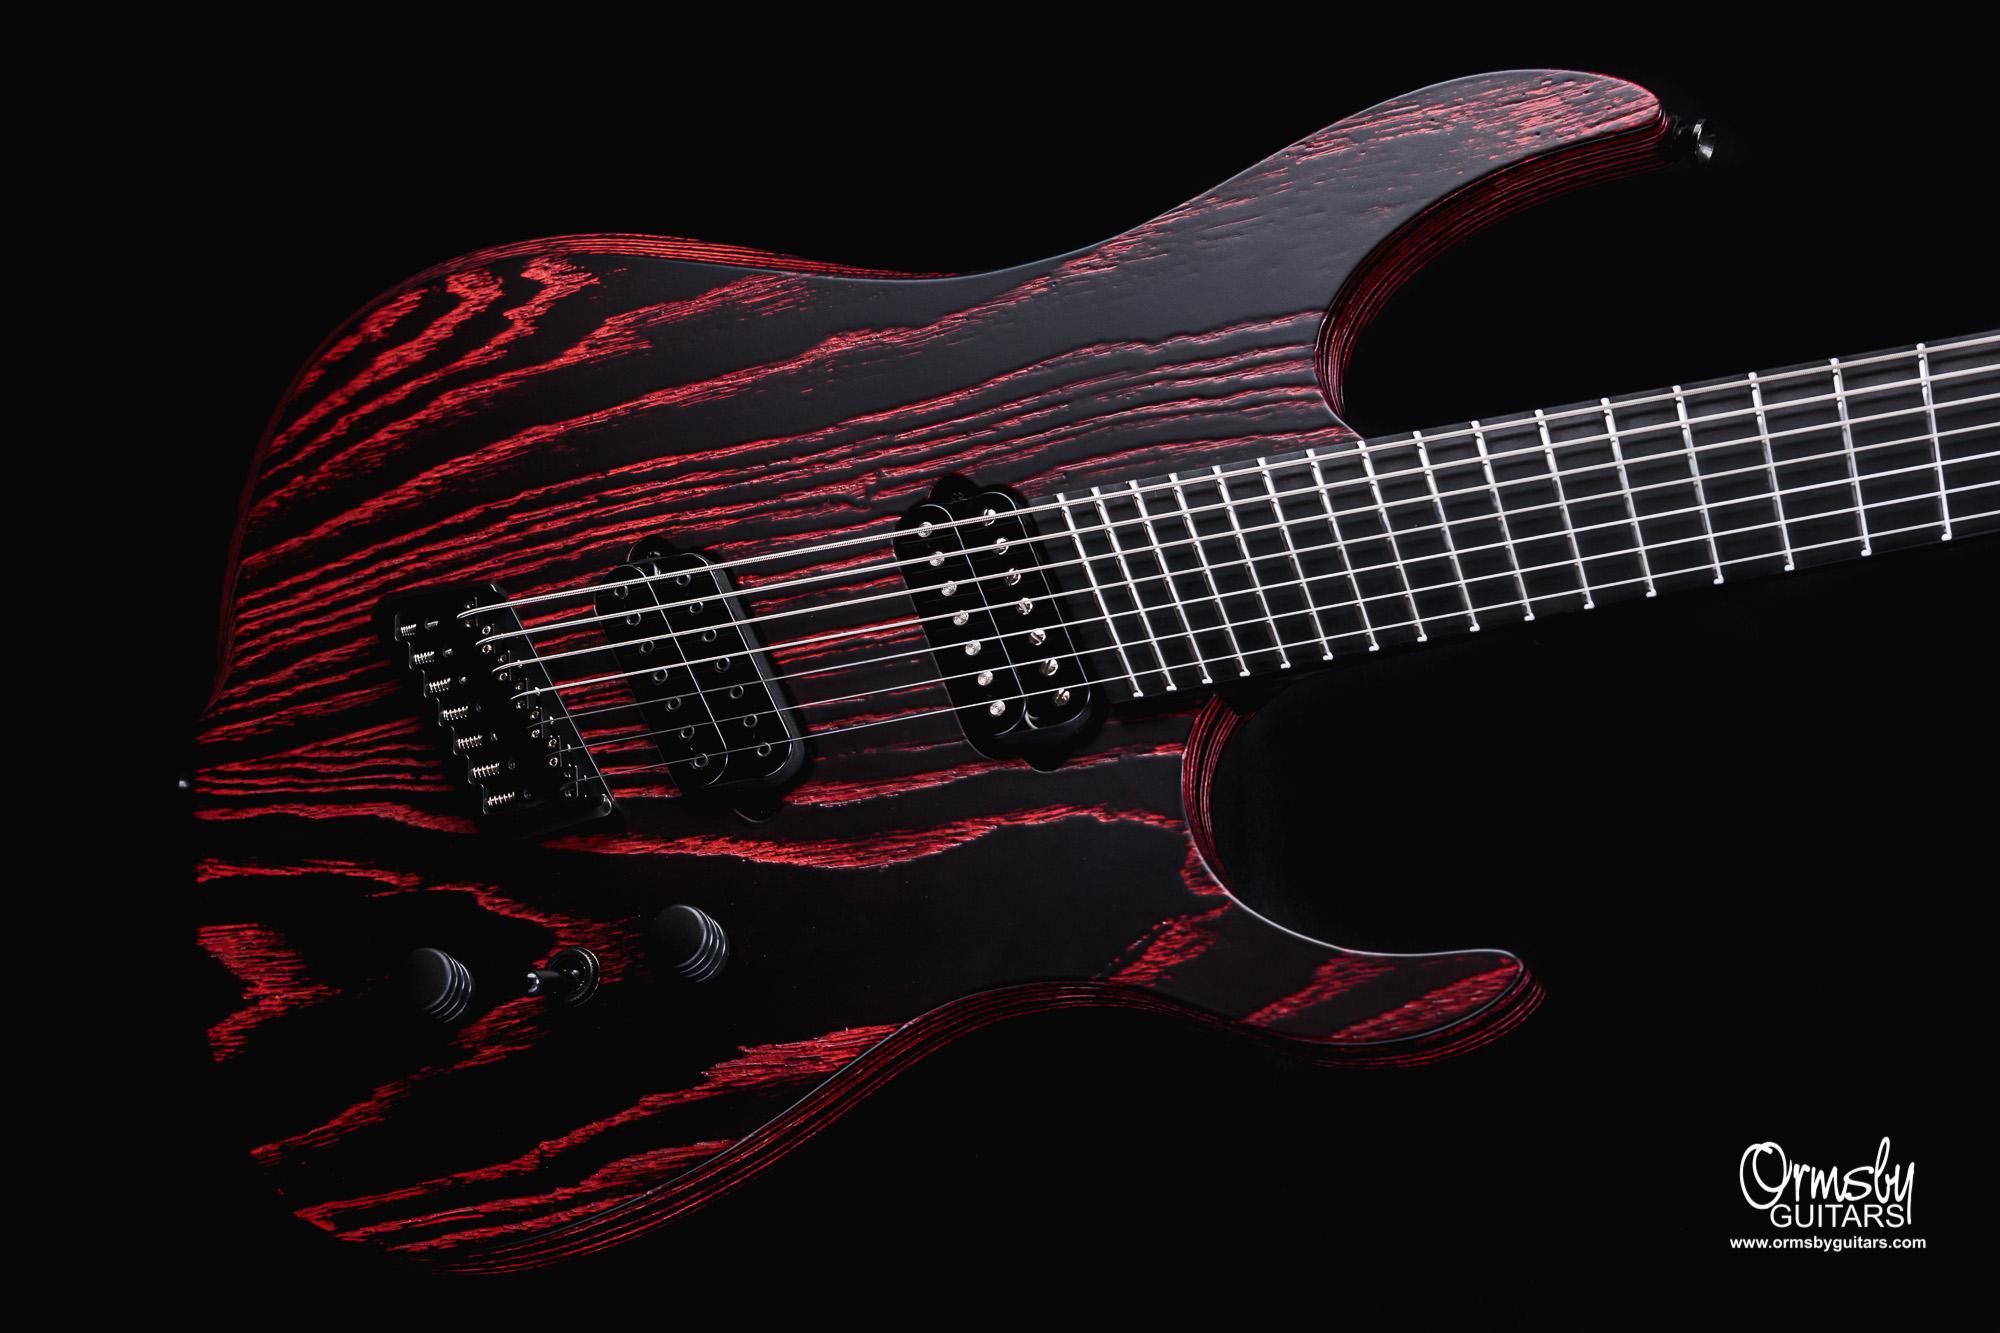 Ormsby Guitars Custom Finish